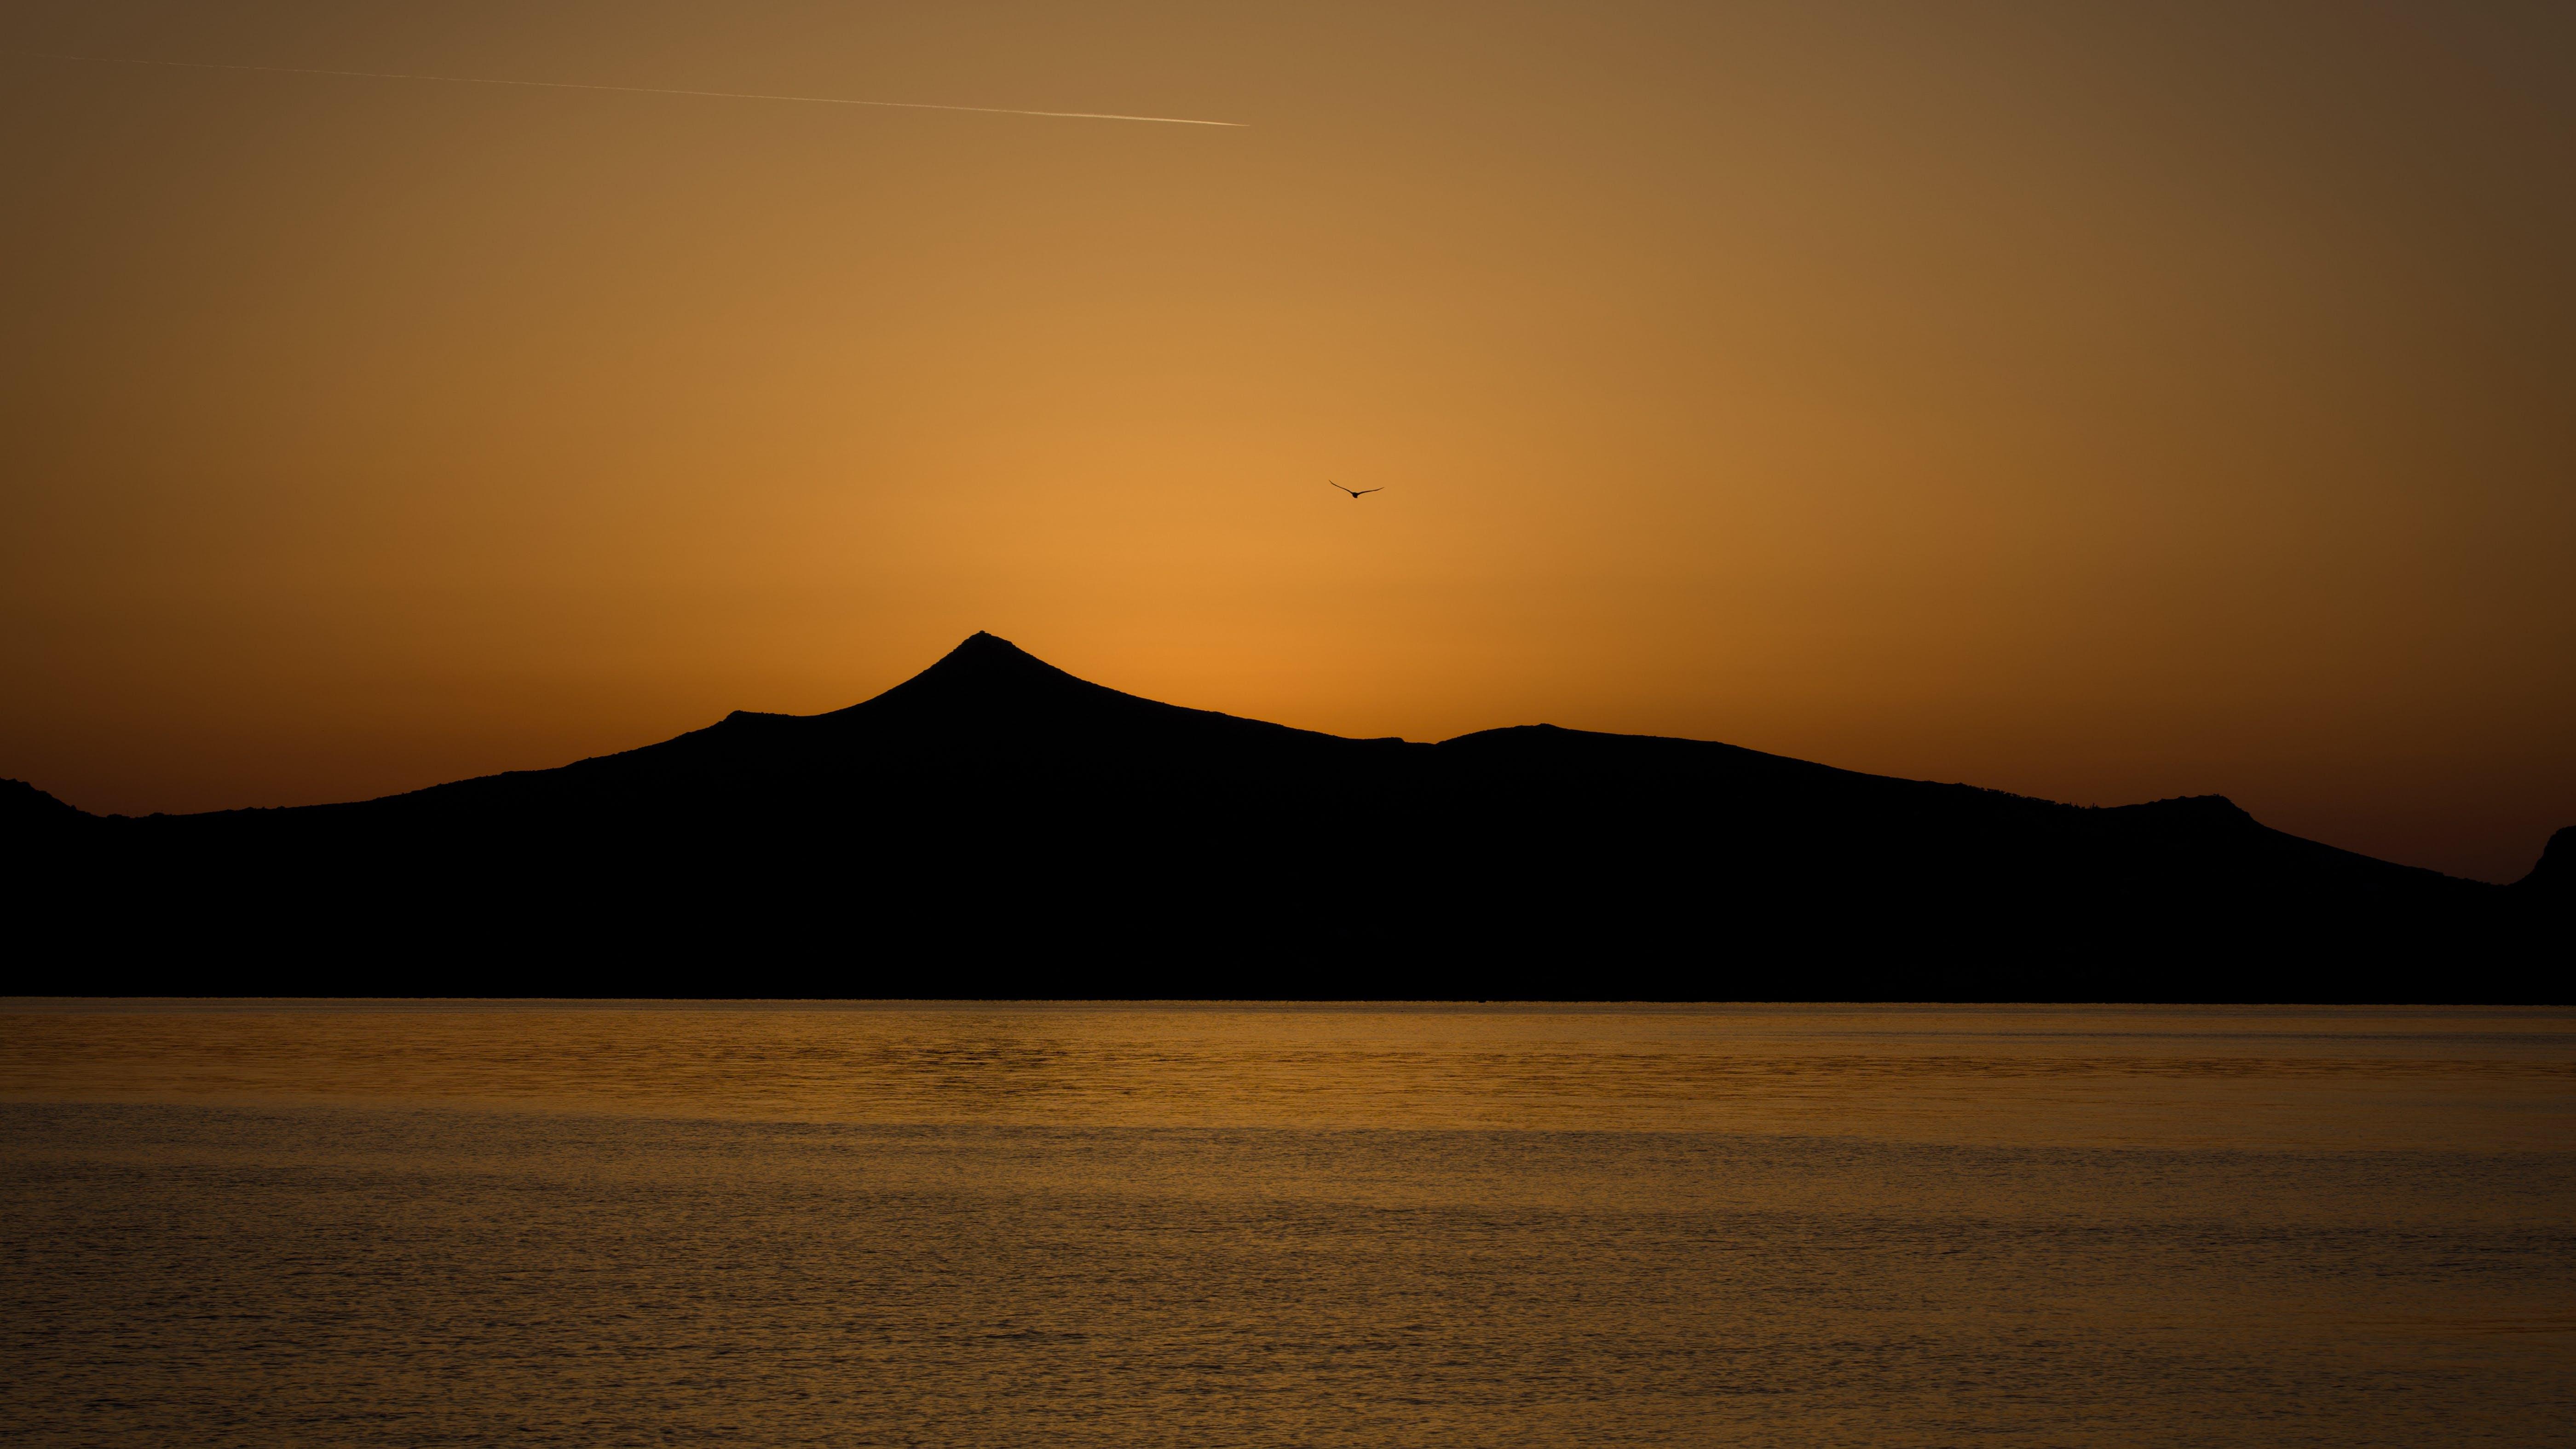 Free stock photo of landscape, romantic, island, golden hour